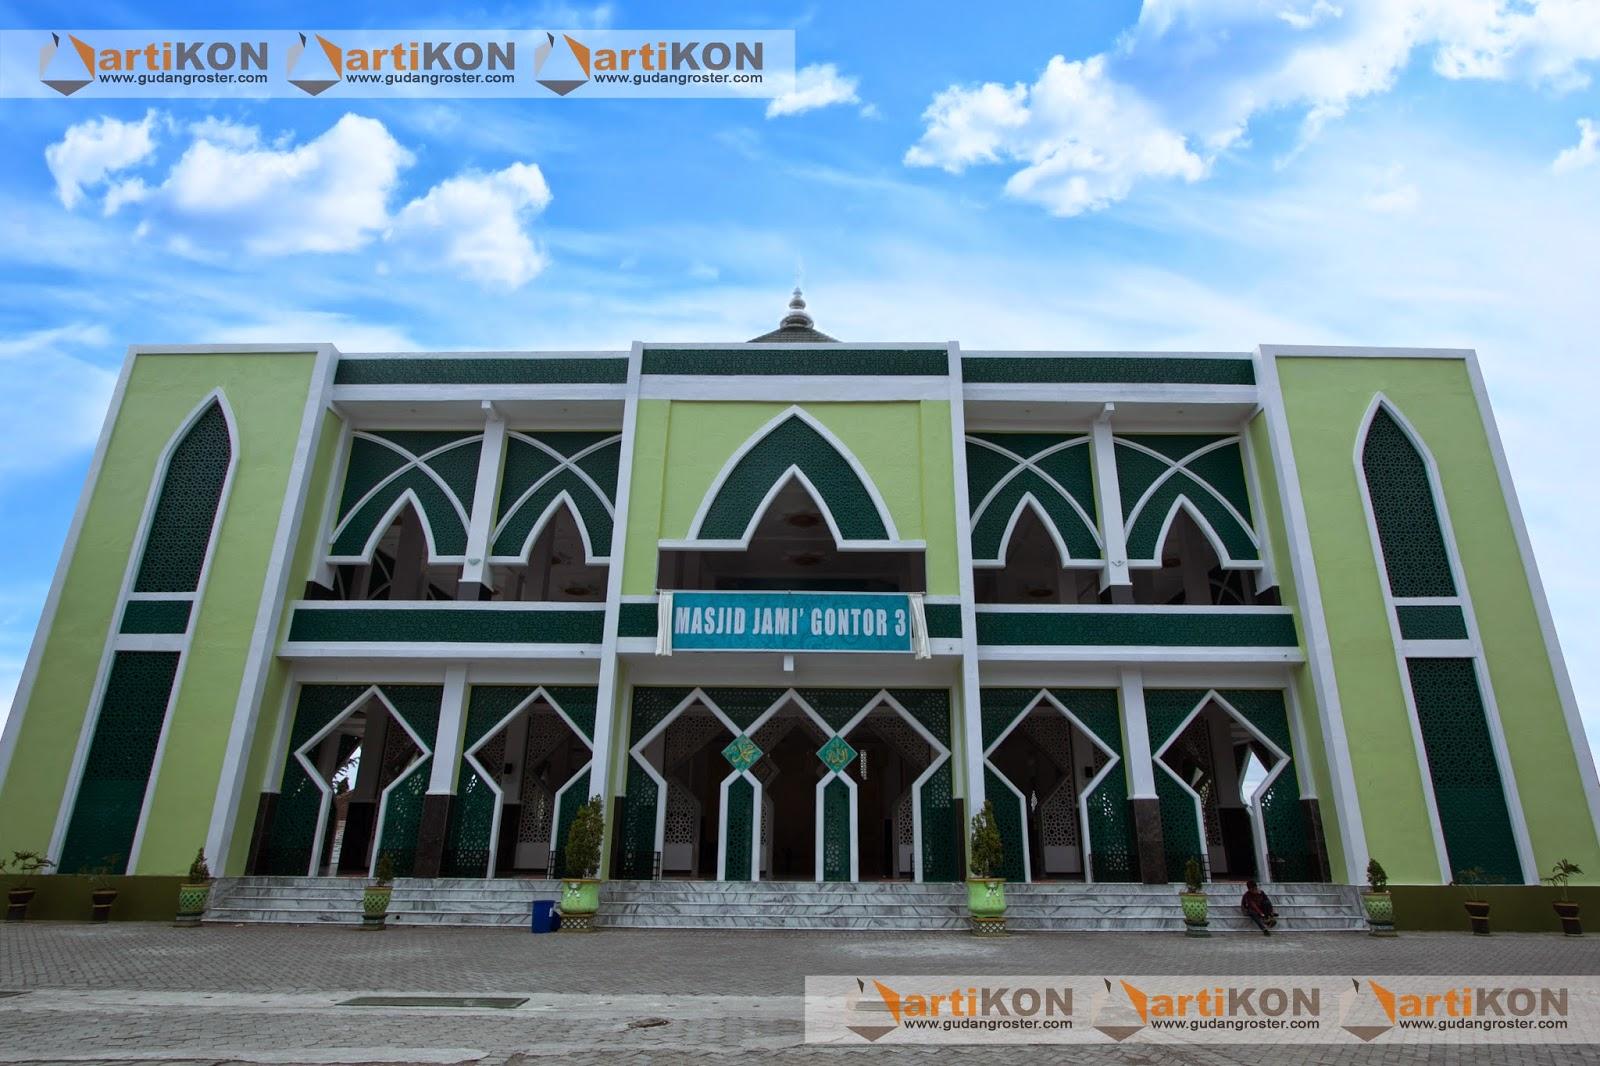 GRC ARTIKON Kerja Sama Pembangunan Masjid Jami Gontor 3